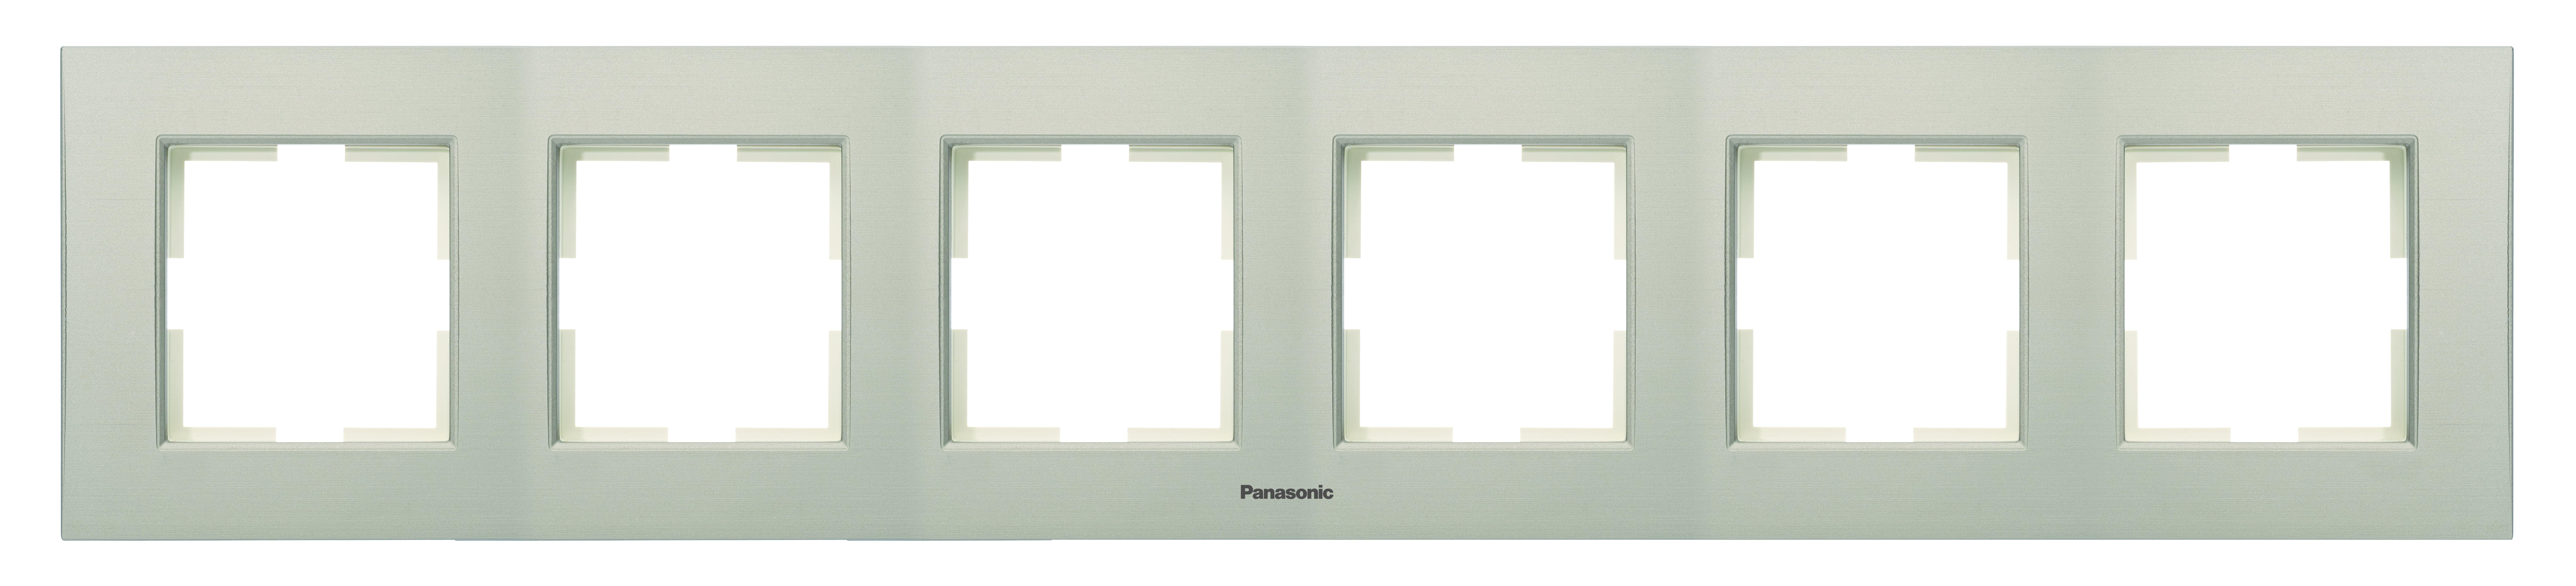 Рамка Panasonic Wktf0804-2dg-res karre plus dg рамка для фото jardo